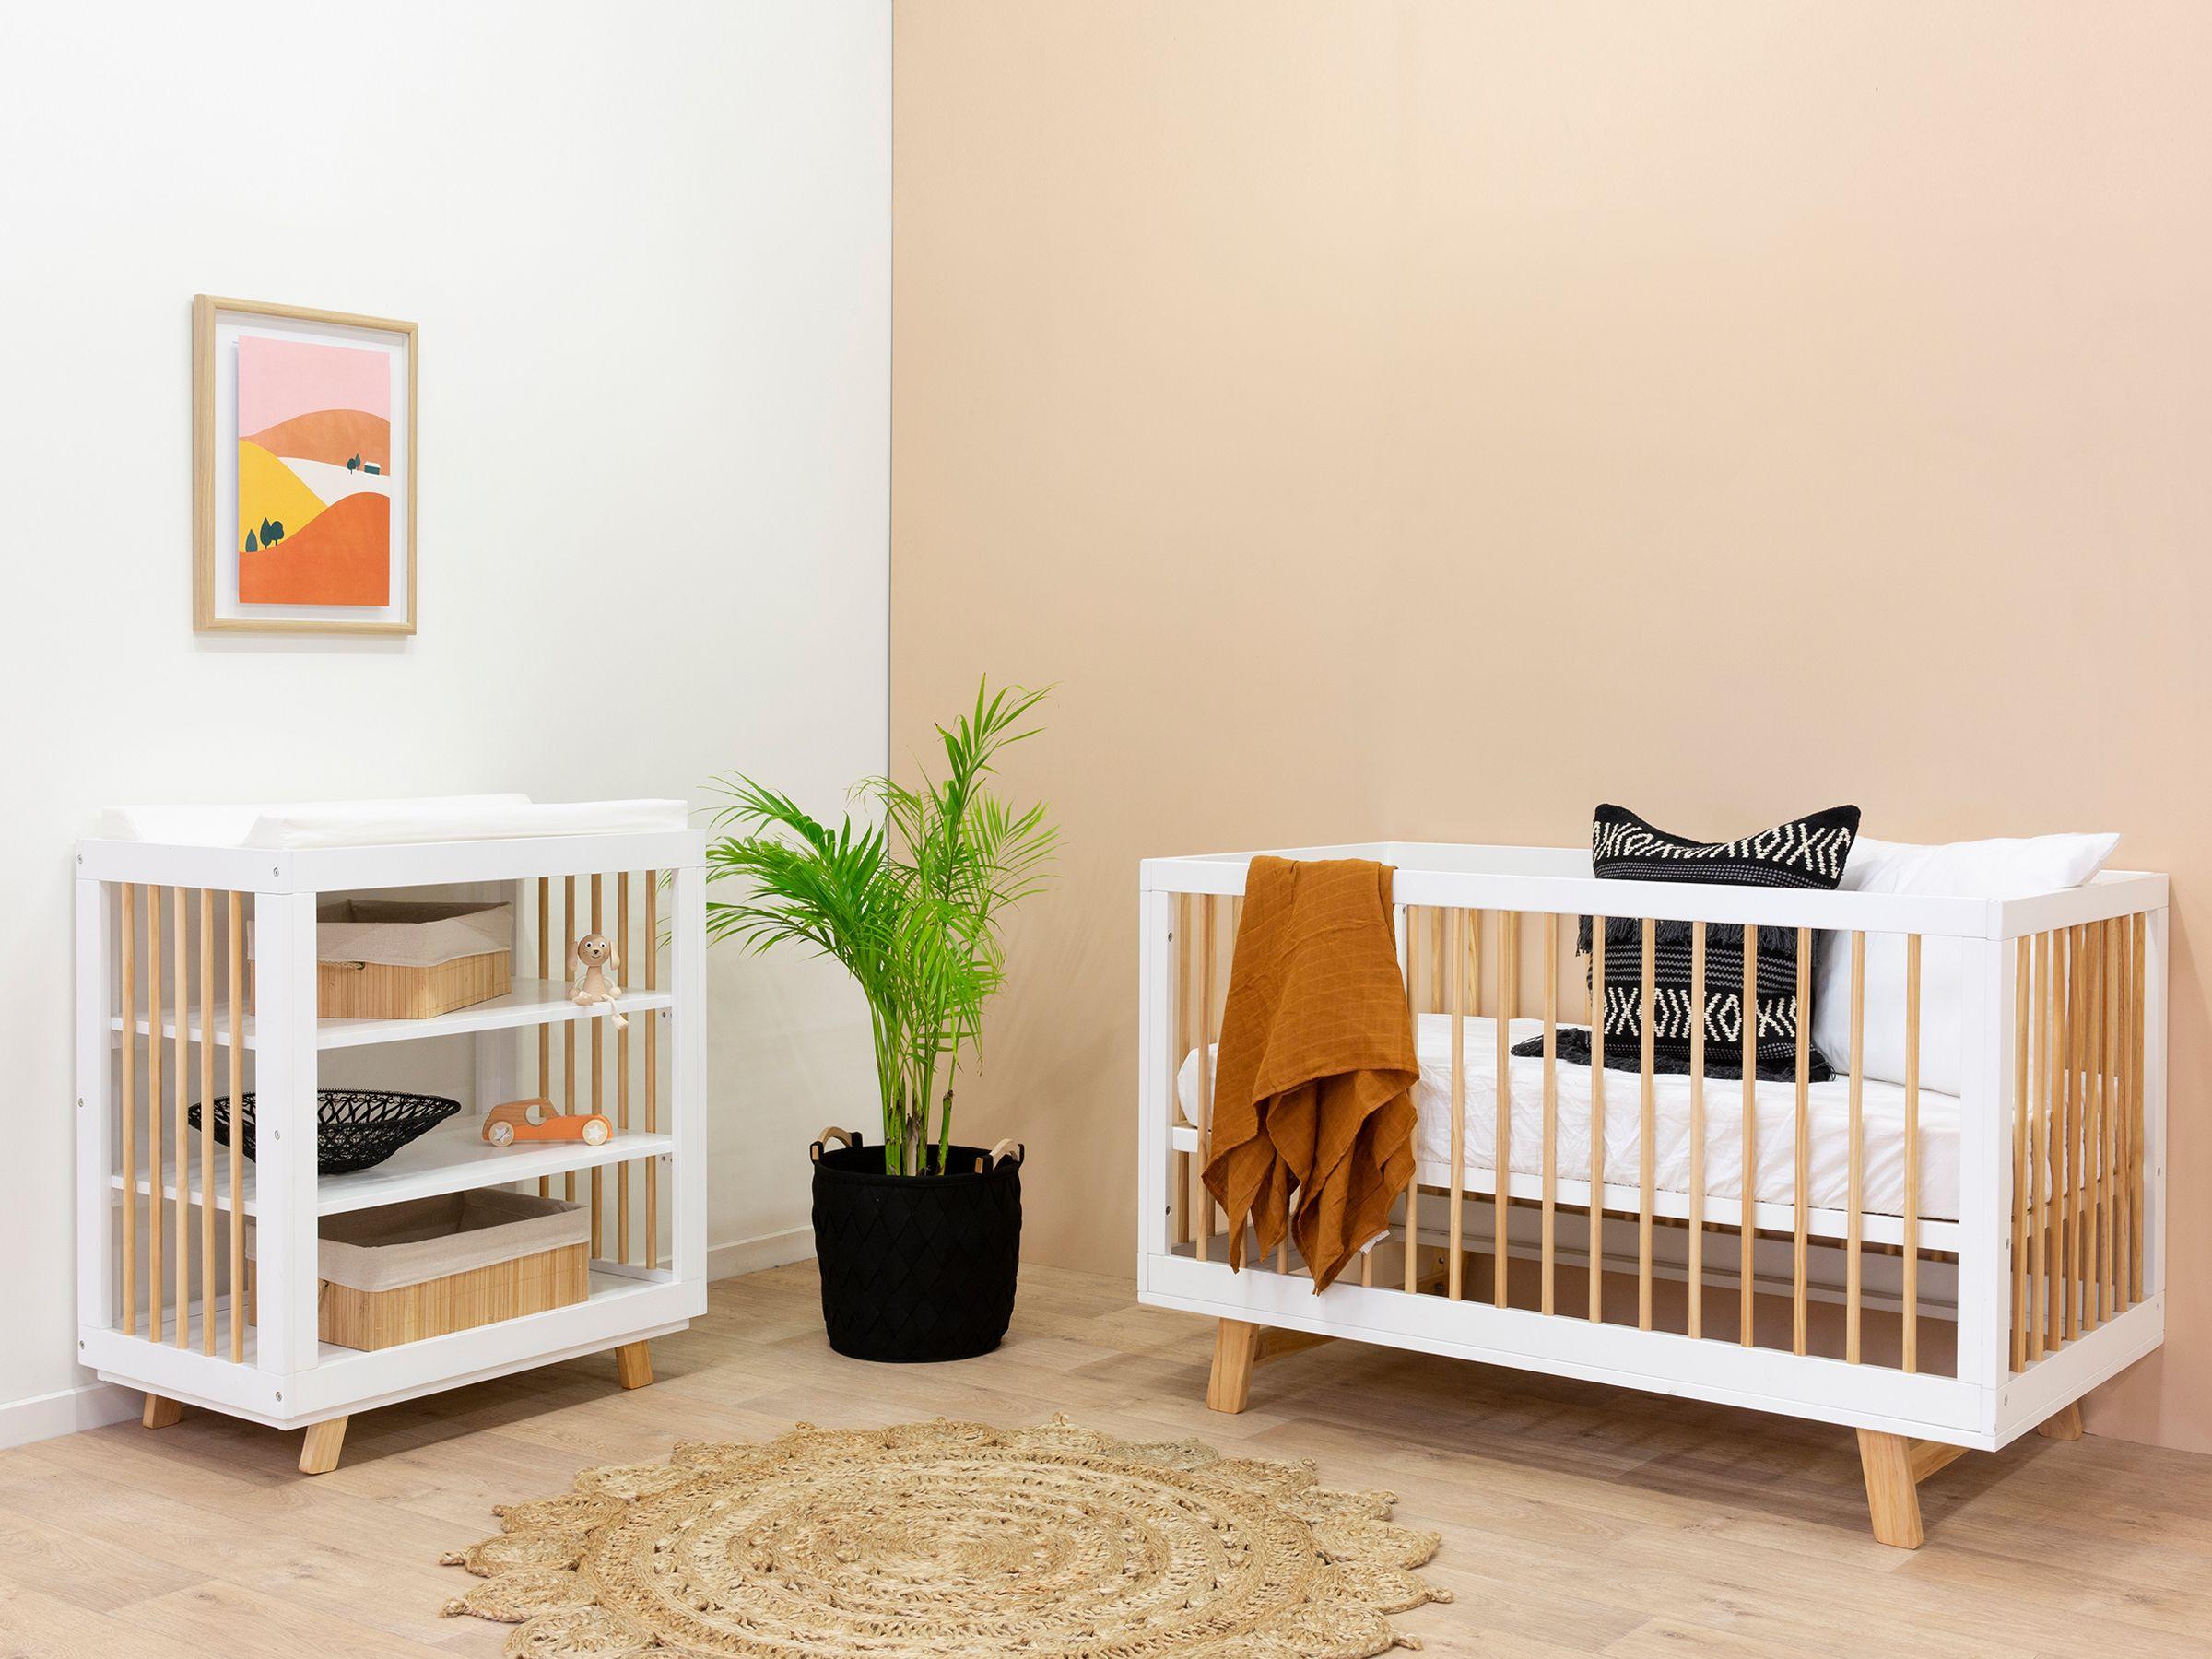 Mocka Aspen Nursery   Furniture packages, Affordable nursery